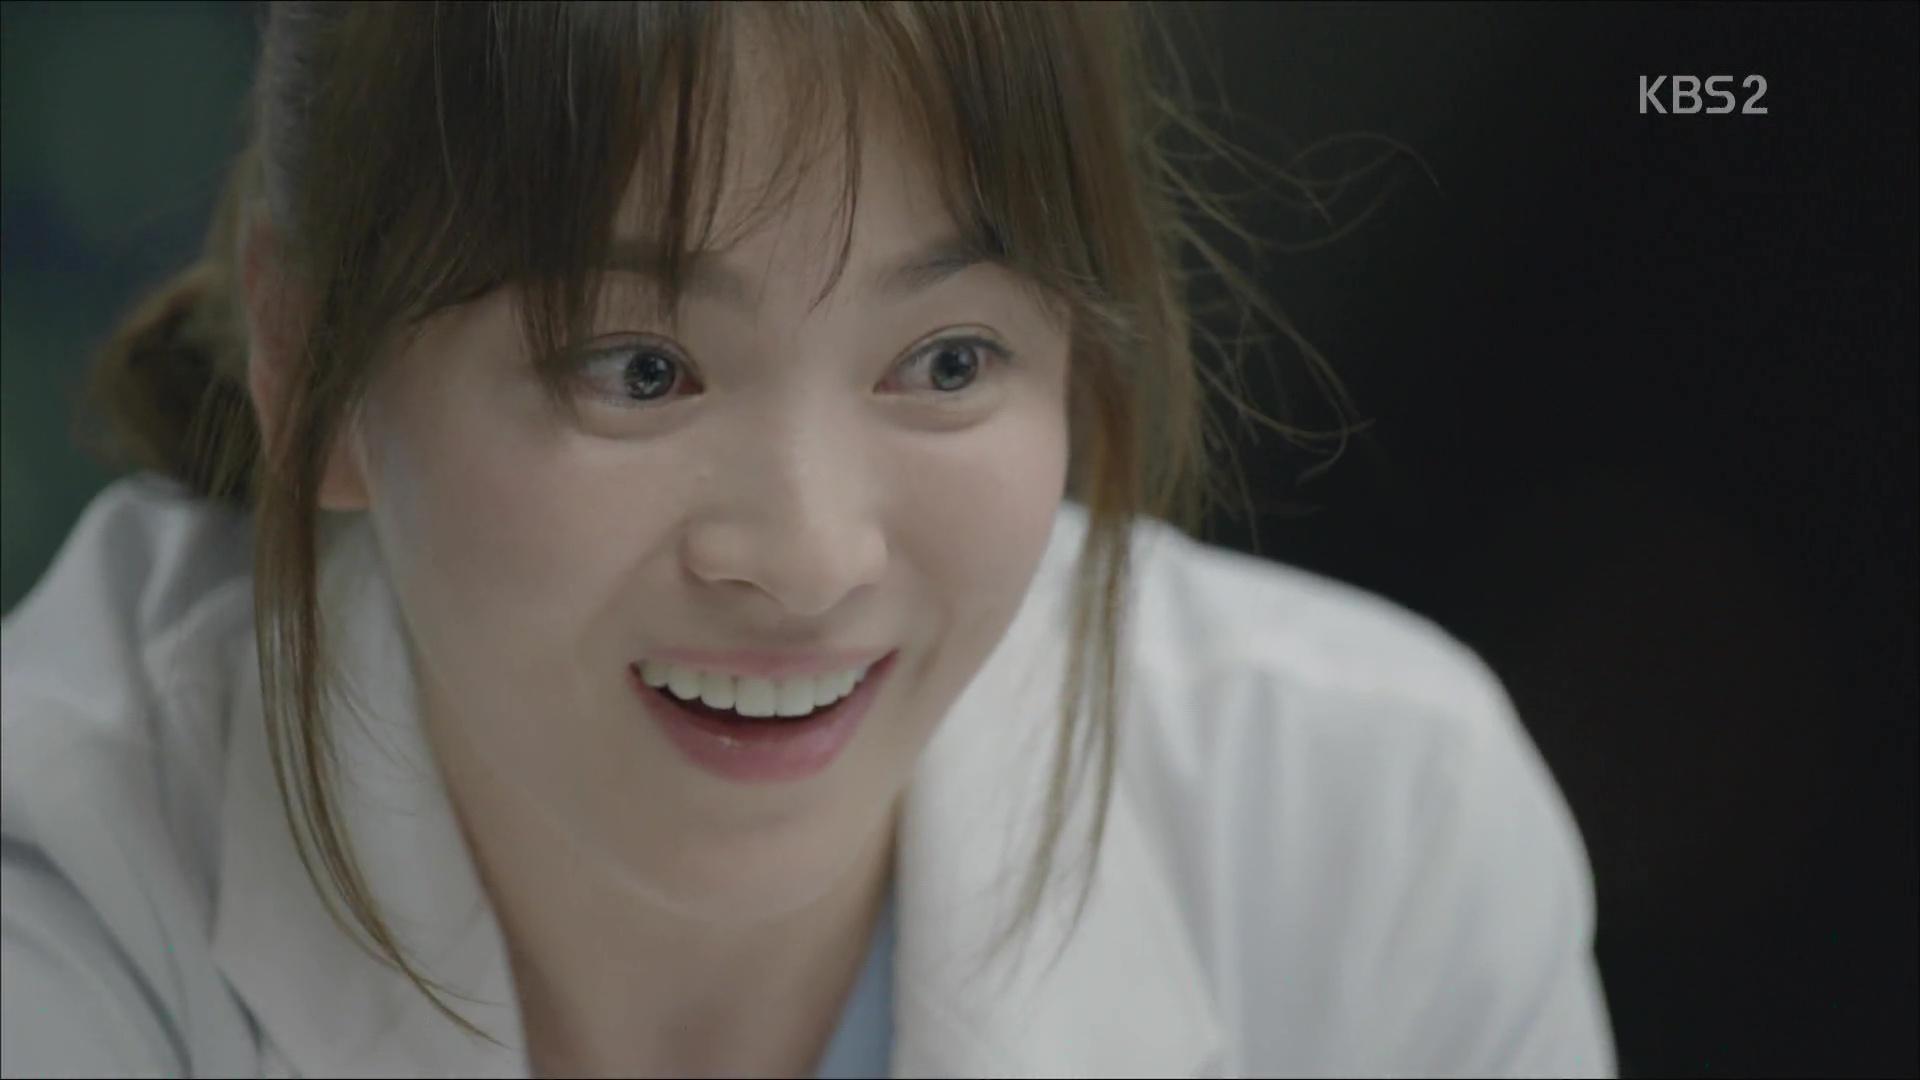 Mo Yeon Descendants Of The Sun - HD Wallpaper